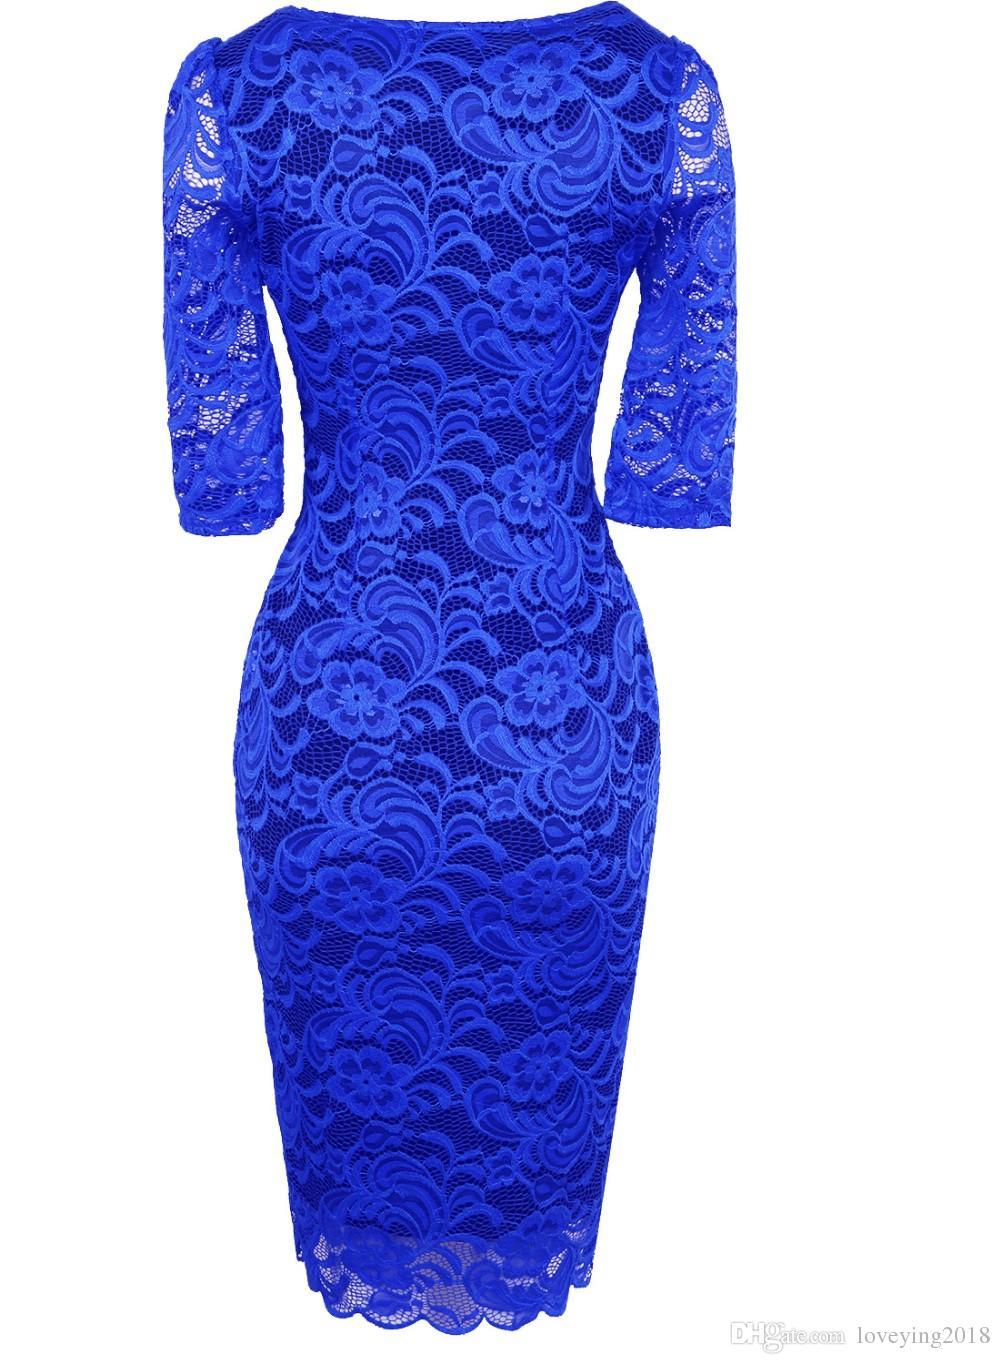 Loveying Women Elegant Pencil Dress Half Sleeves Vestidos Royal Blue Wedding Office Business Cocktail Bodycon Retro Black Lace Dresses 2018